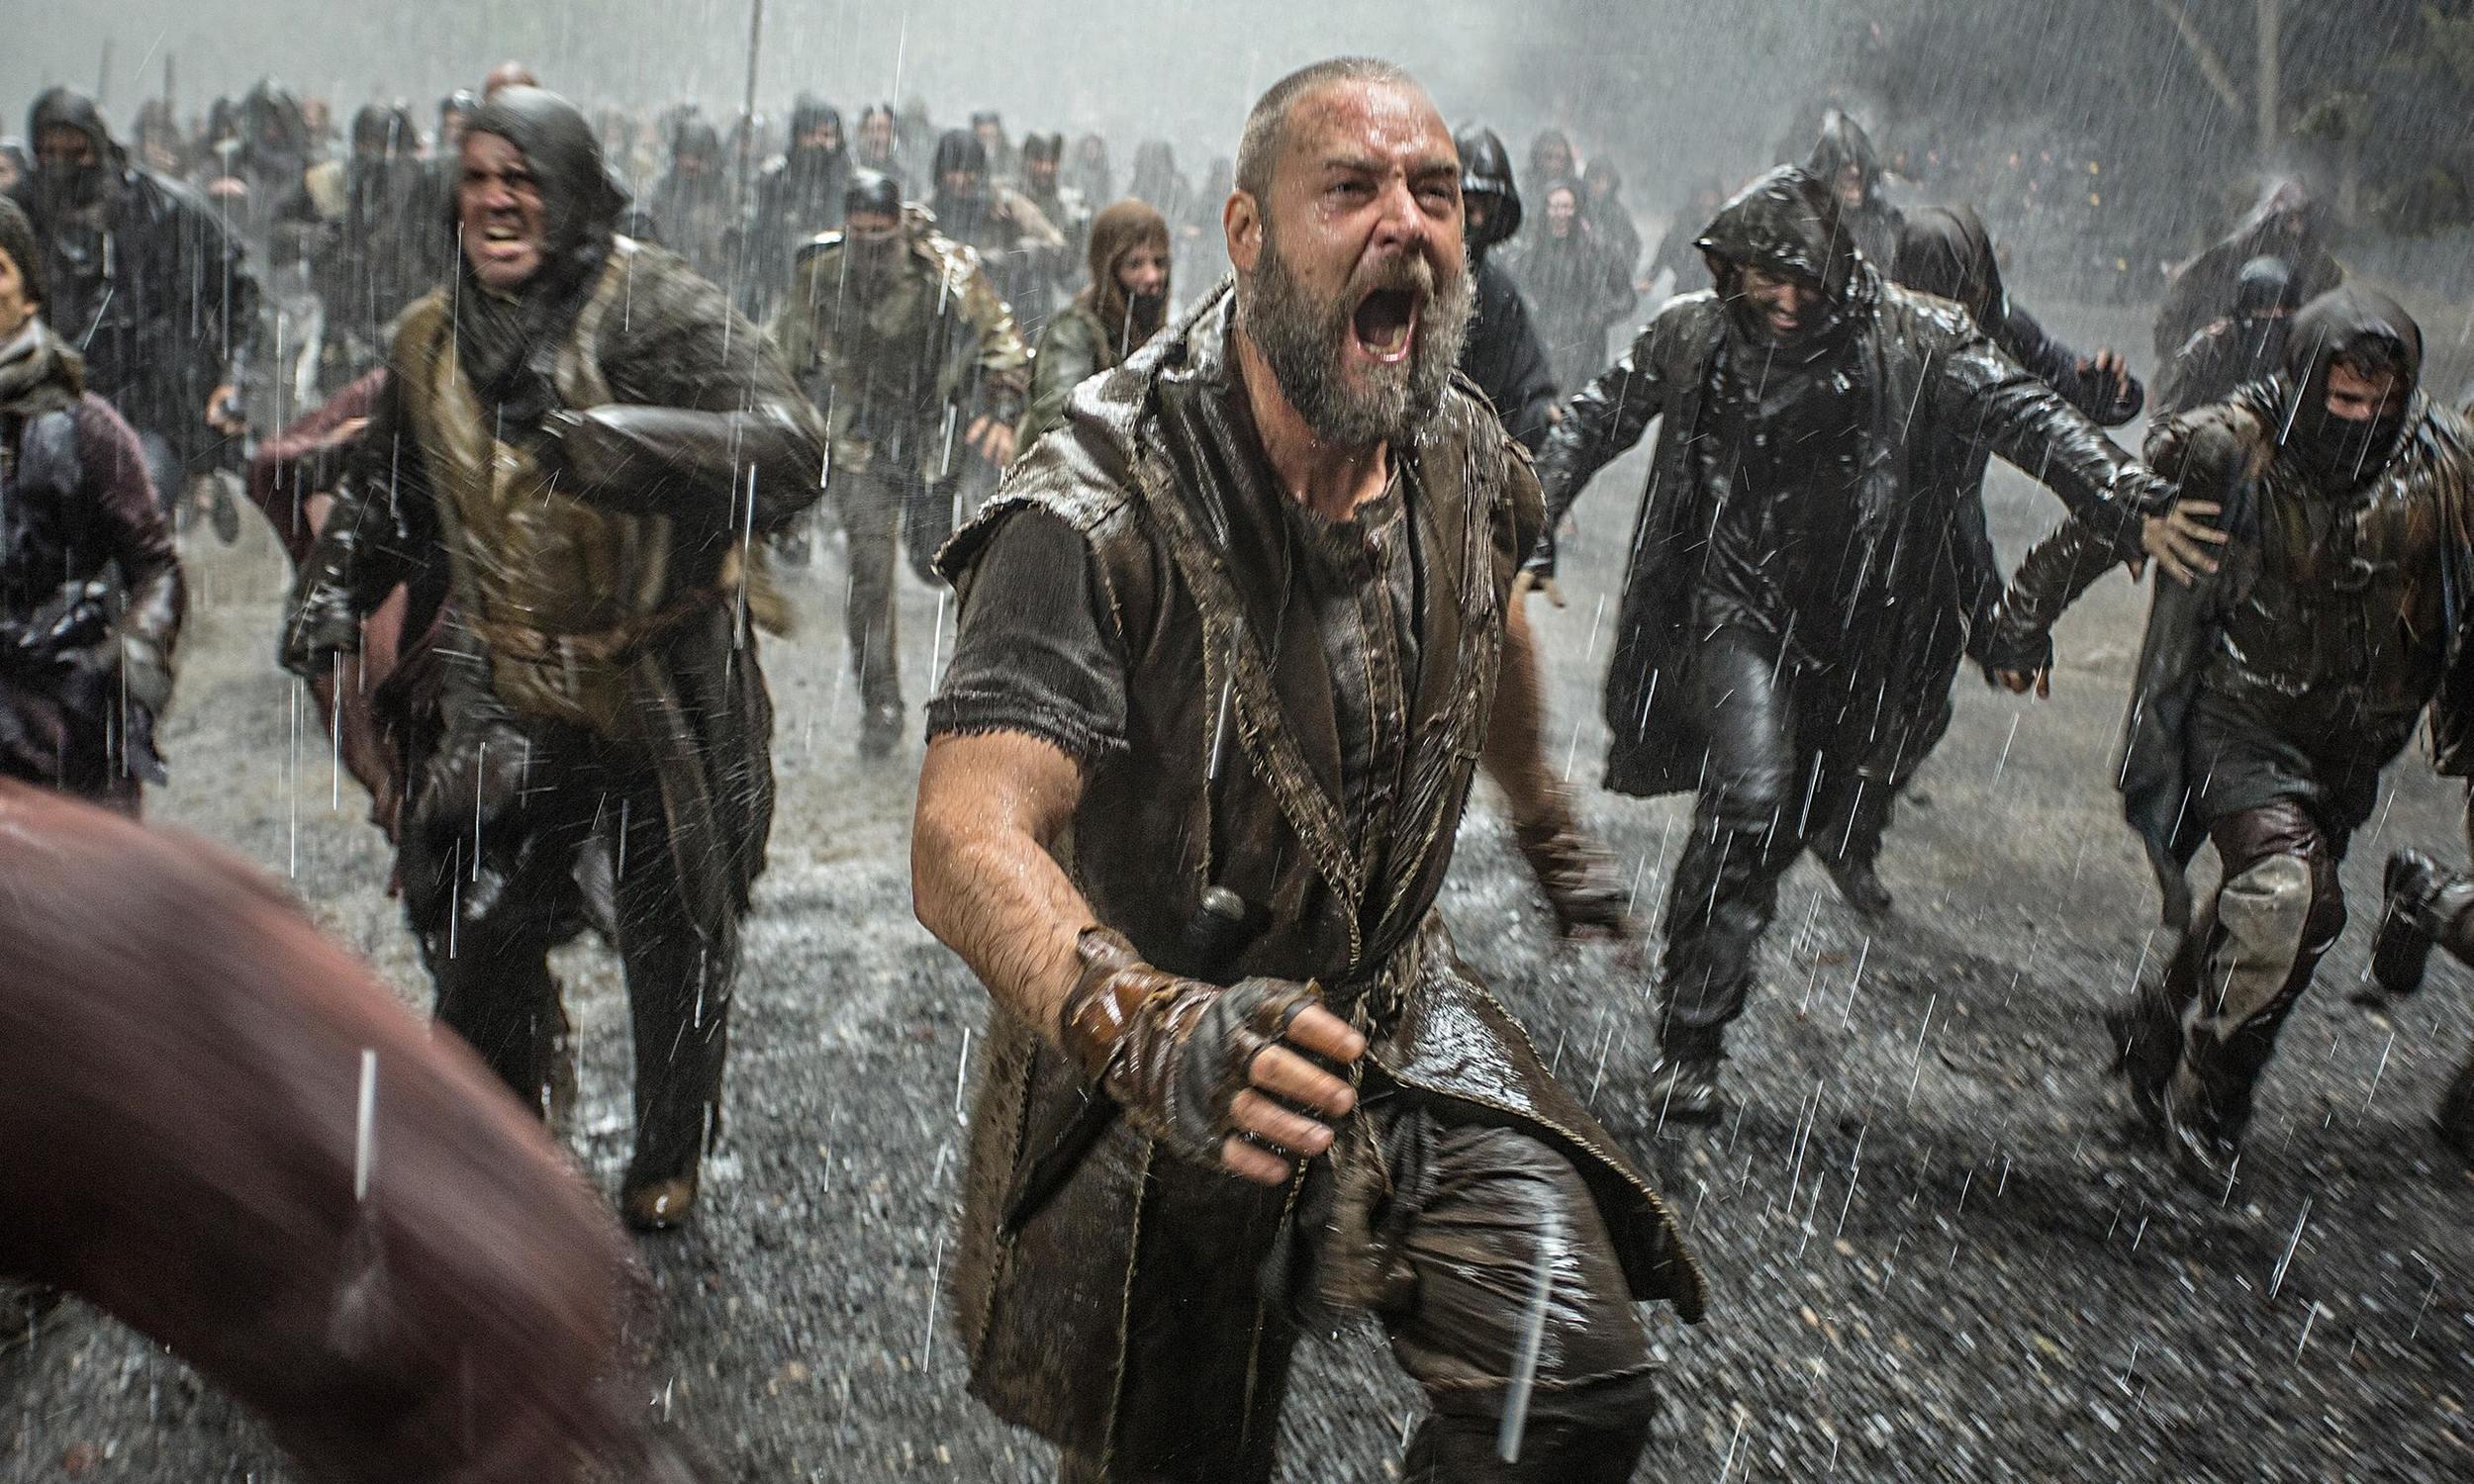 Noah heads off potential stowaways on his ark